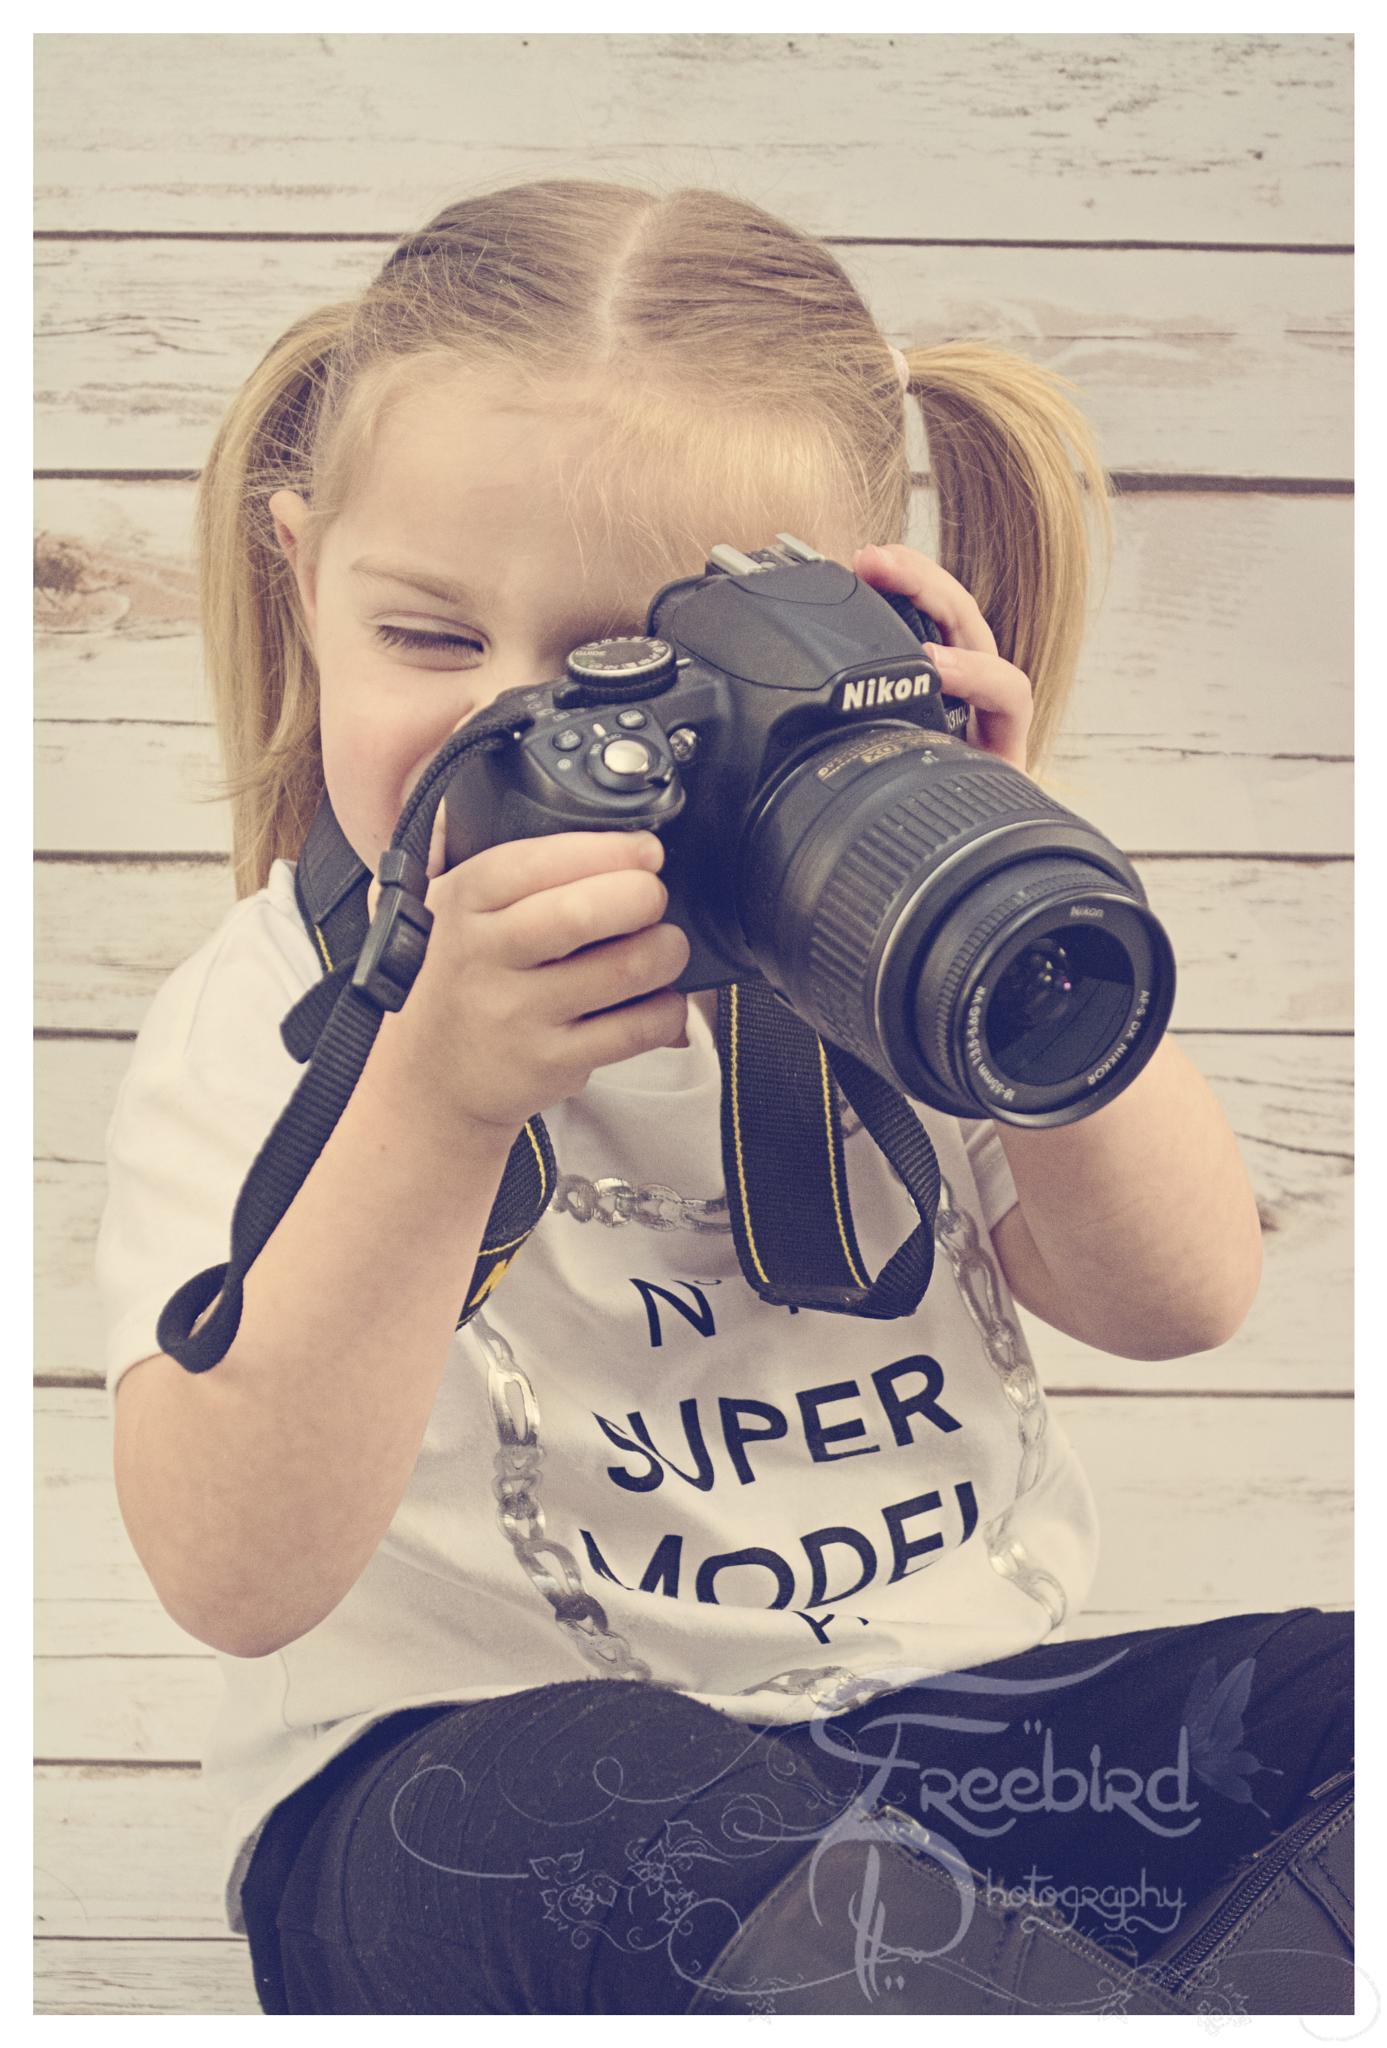 Mummy's helper by FreebirdphotographyUK